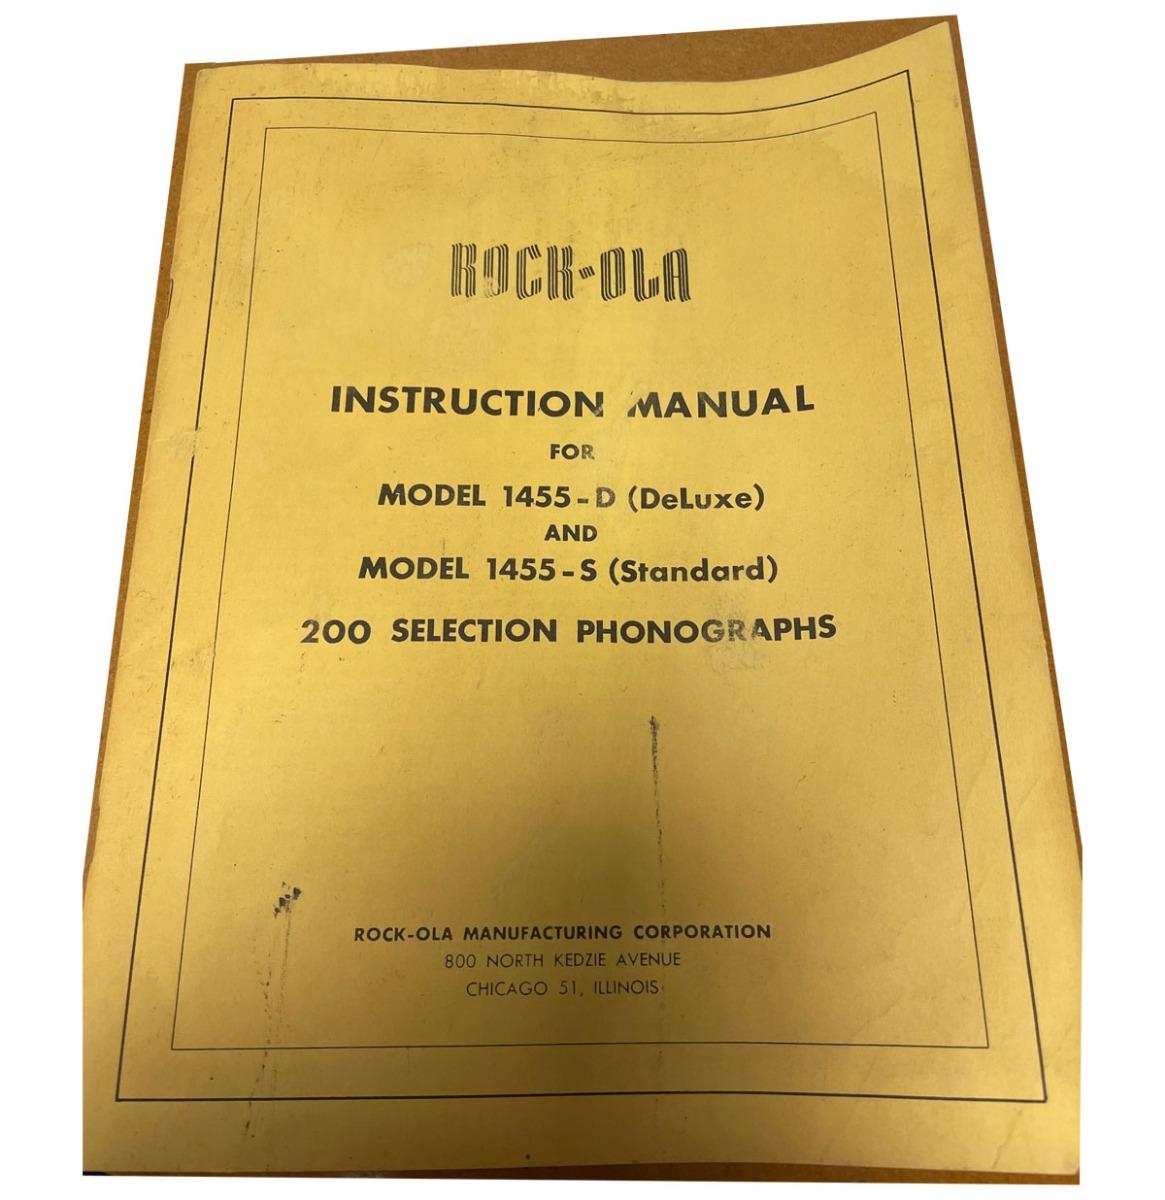 Rock-Ola Instructies Manual 1455-D And 1455-S Origineel